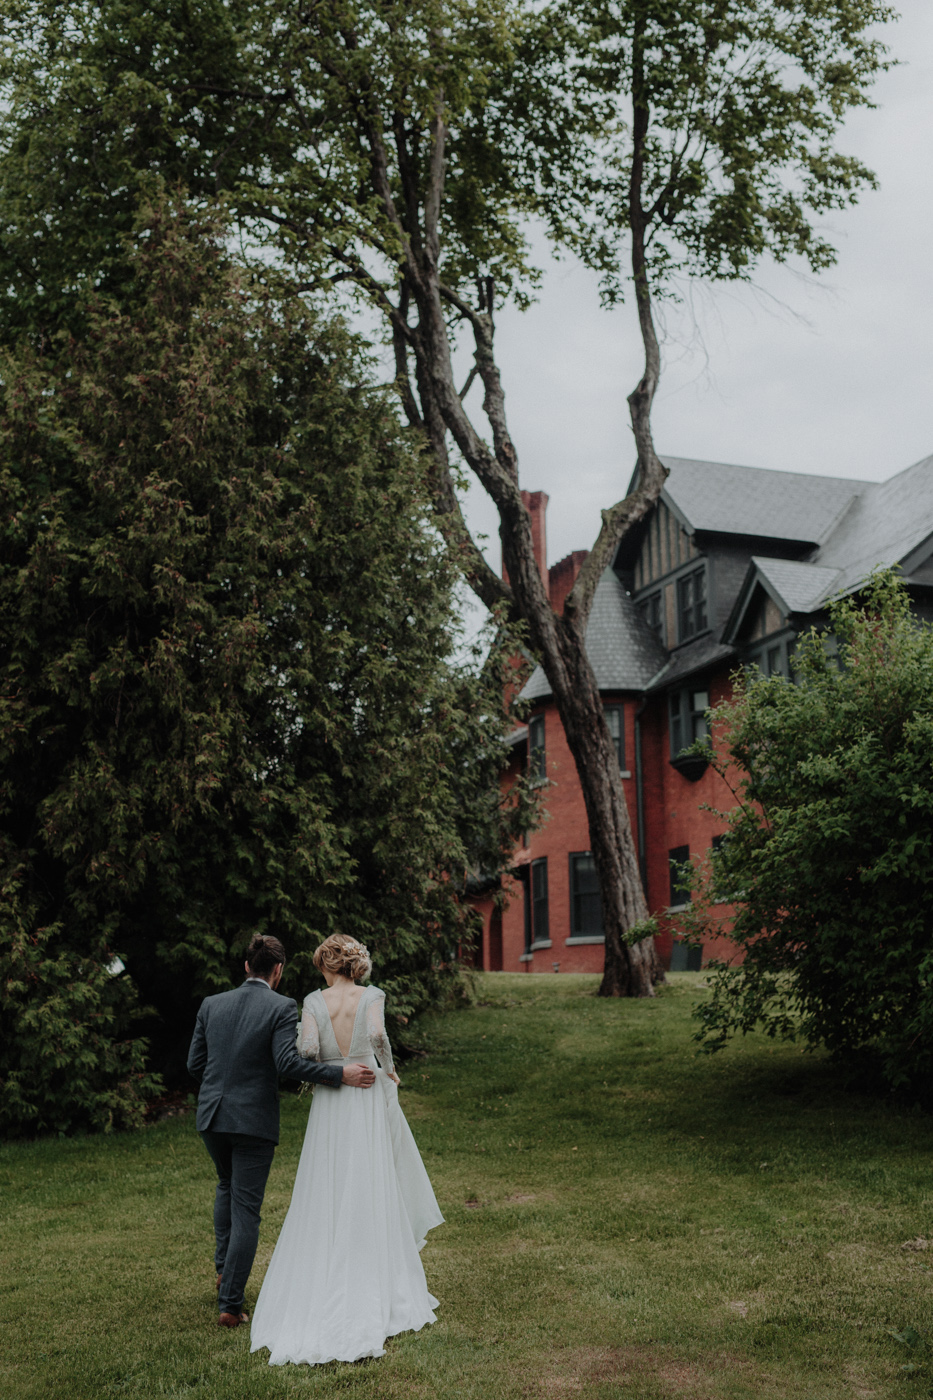 Erin-Mike-Intimate-Vintage-Wedding-Shelburne-Farms-Vermont -136.jpg